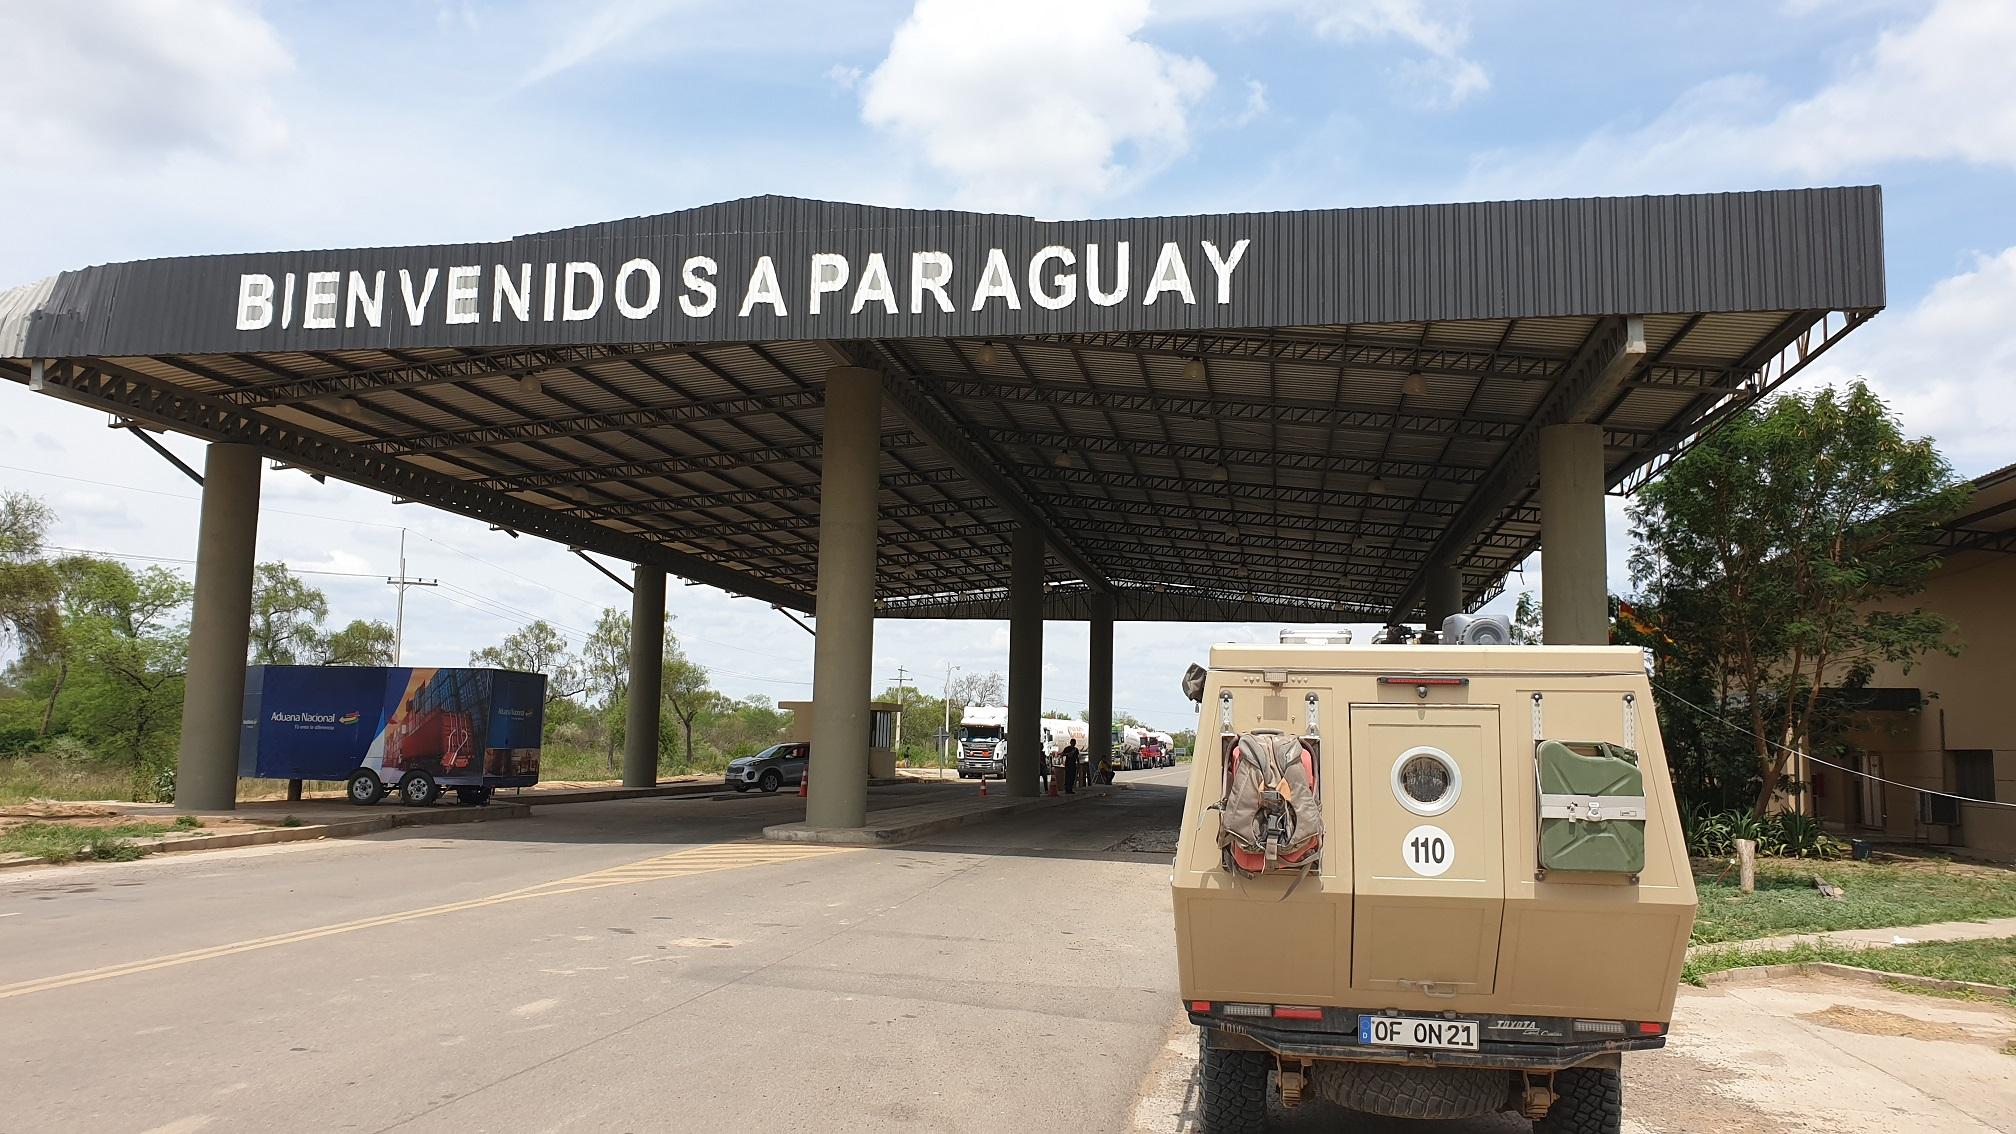 Hasta luego Bolivien II – Hola Paraguay